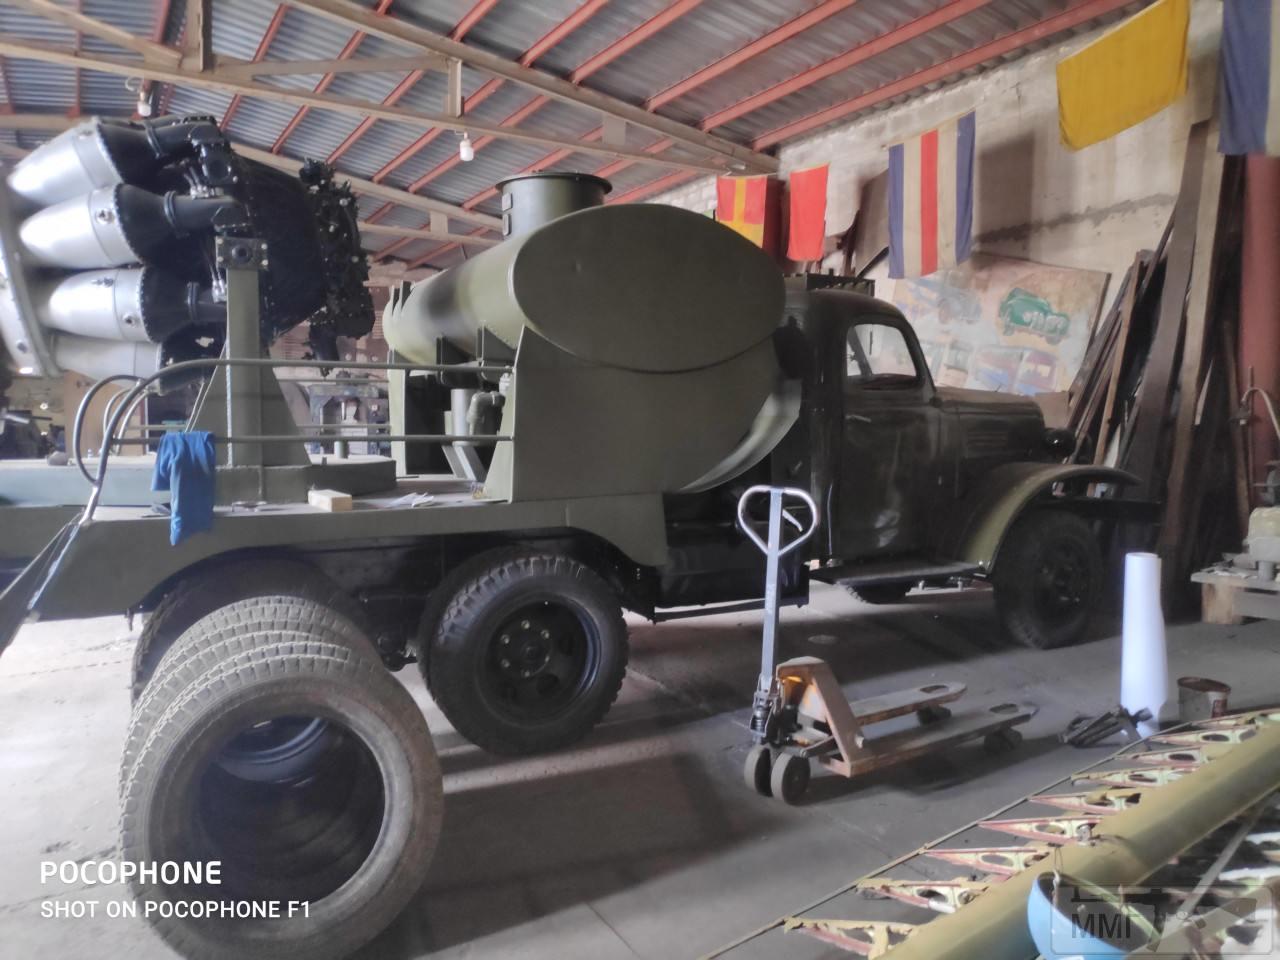 110216 - Музей техники Фаэтон в г. Запорожье